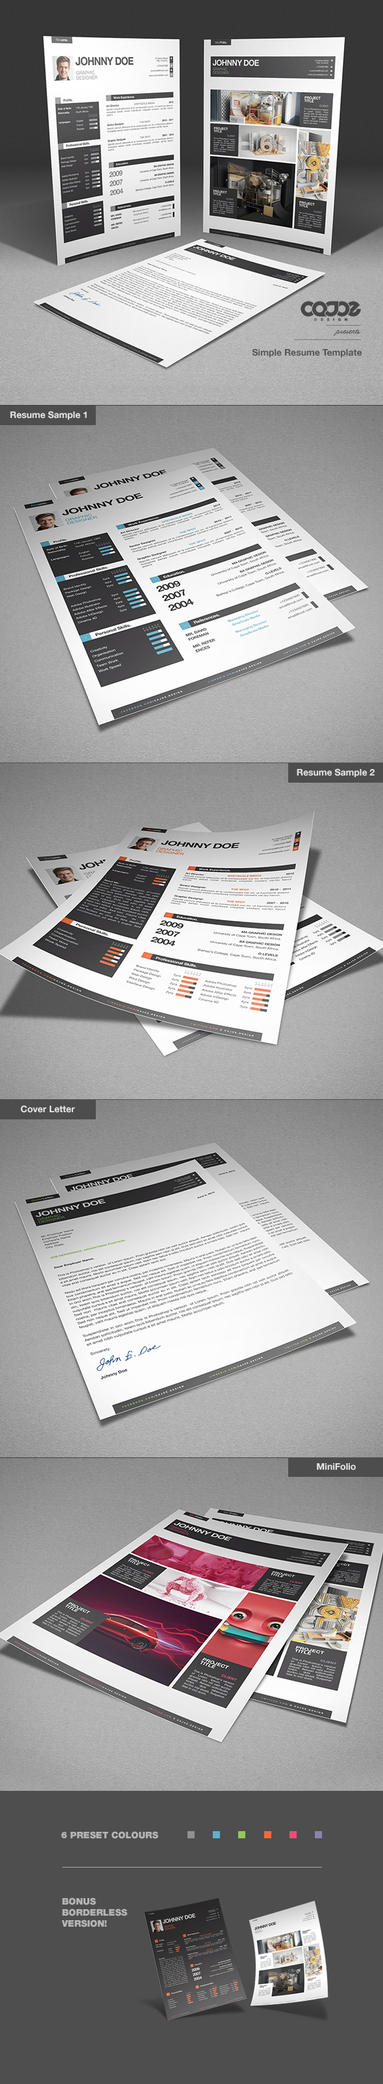 Simple Resume / CV Template and Mini Portfolio by CaJoE-Design